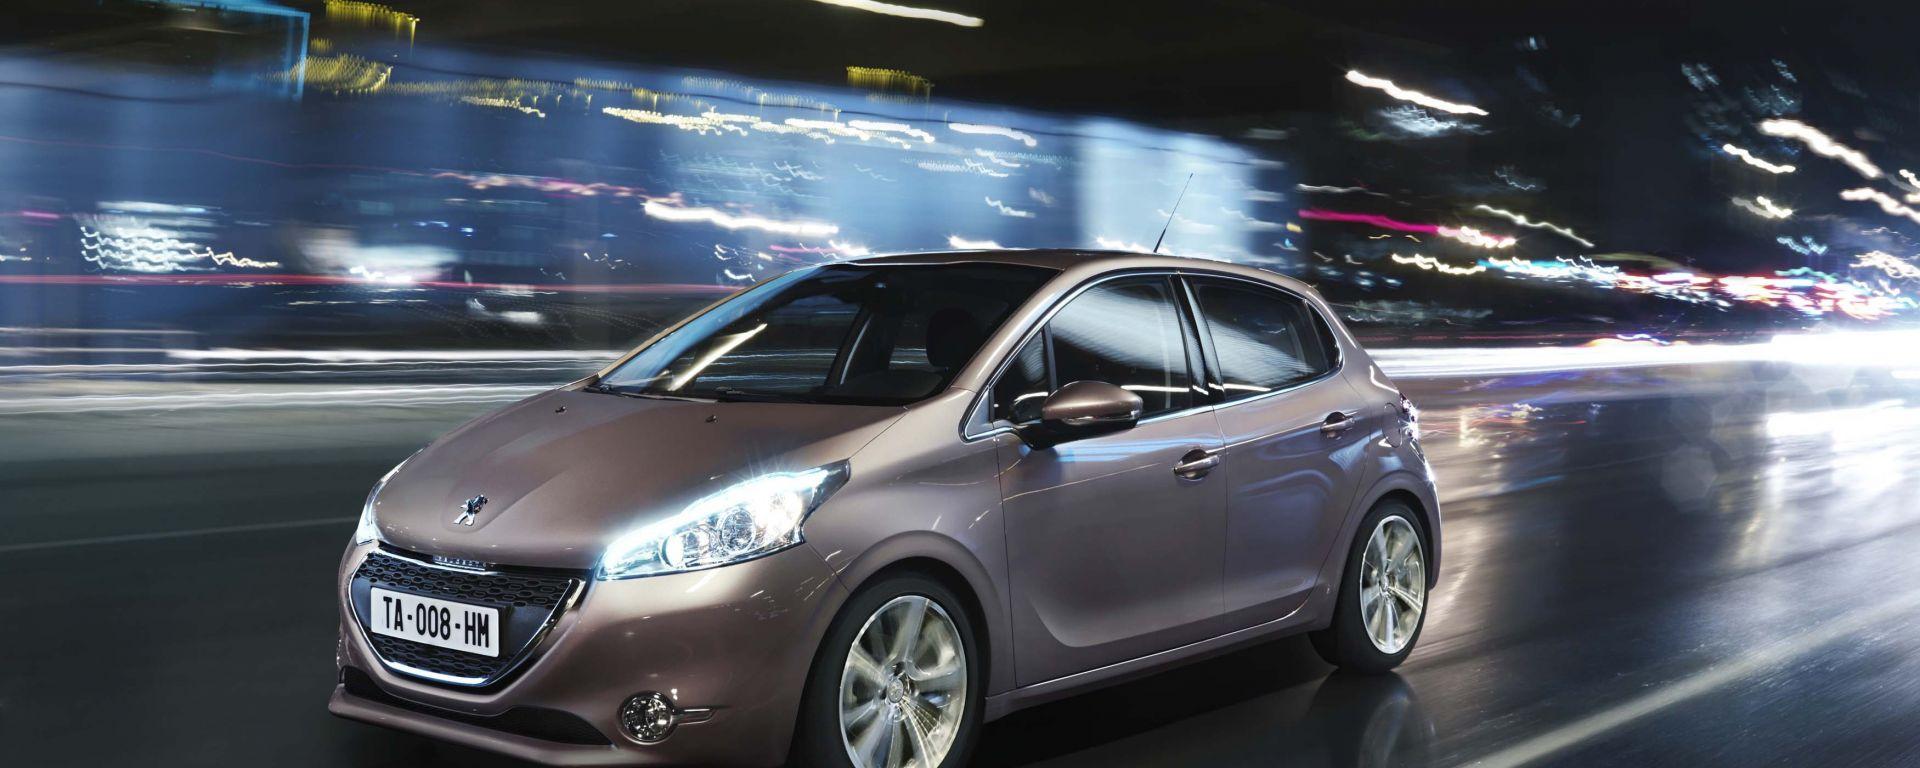 Peugeot 208: le prime foto in HD